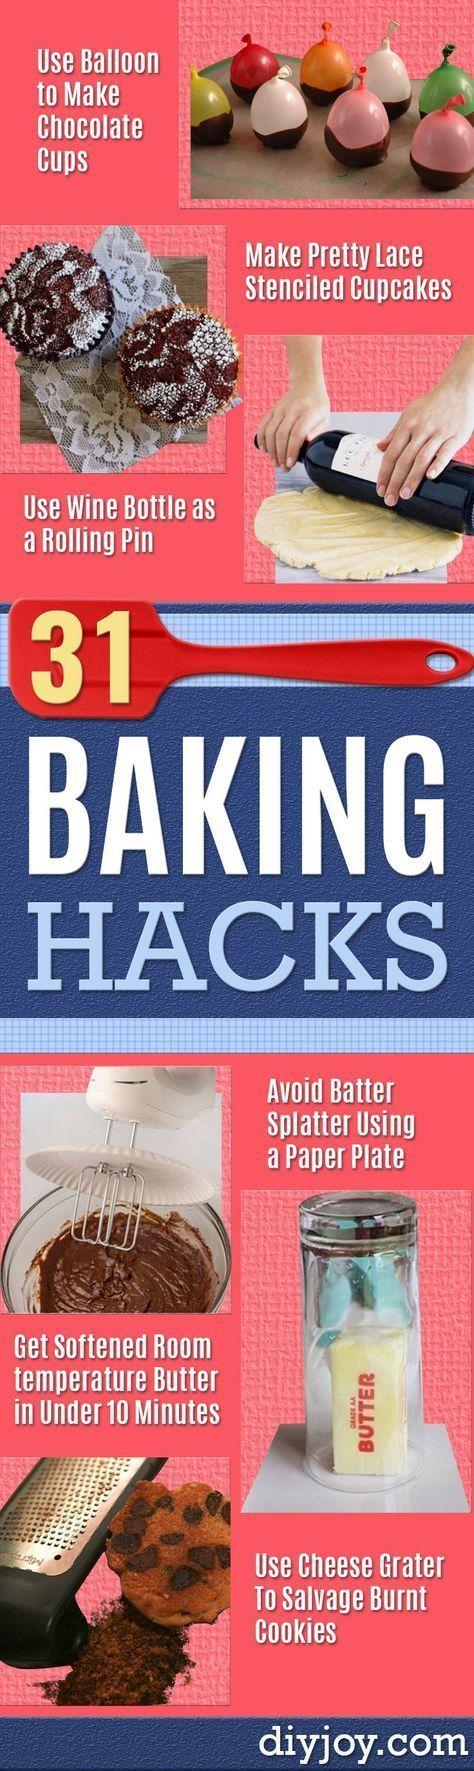 Best Baking Hacks - DIY Cooking Tips and Tricks for Baking Recipes - Quick Ways to Bake Cake, Cupcakes, Desserts and Cookies - Kitchen Lifehacks for Bakers http://diyjoy.com/baking-hacks #cookingtips&hacks